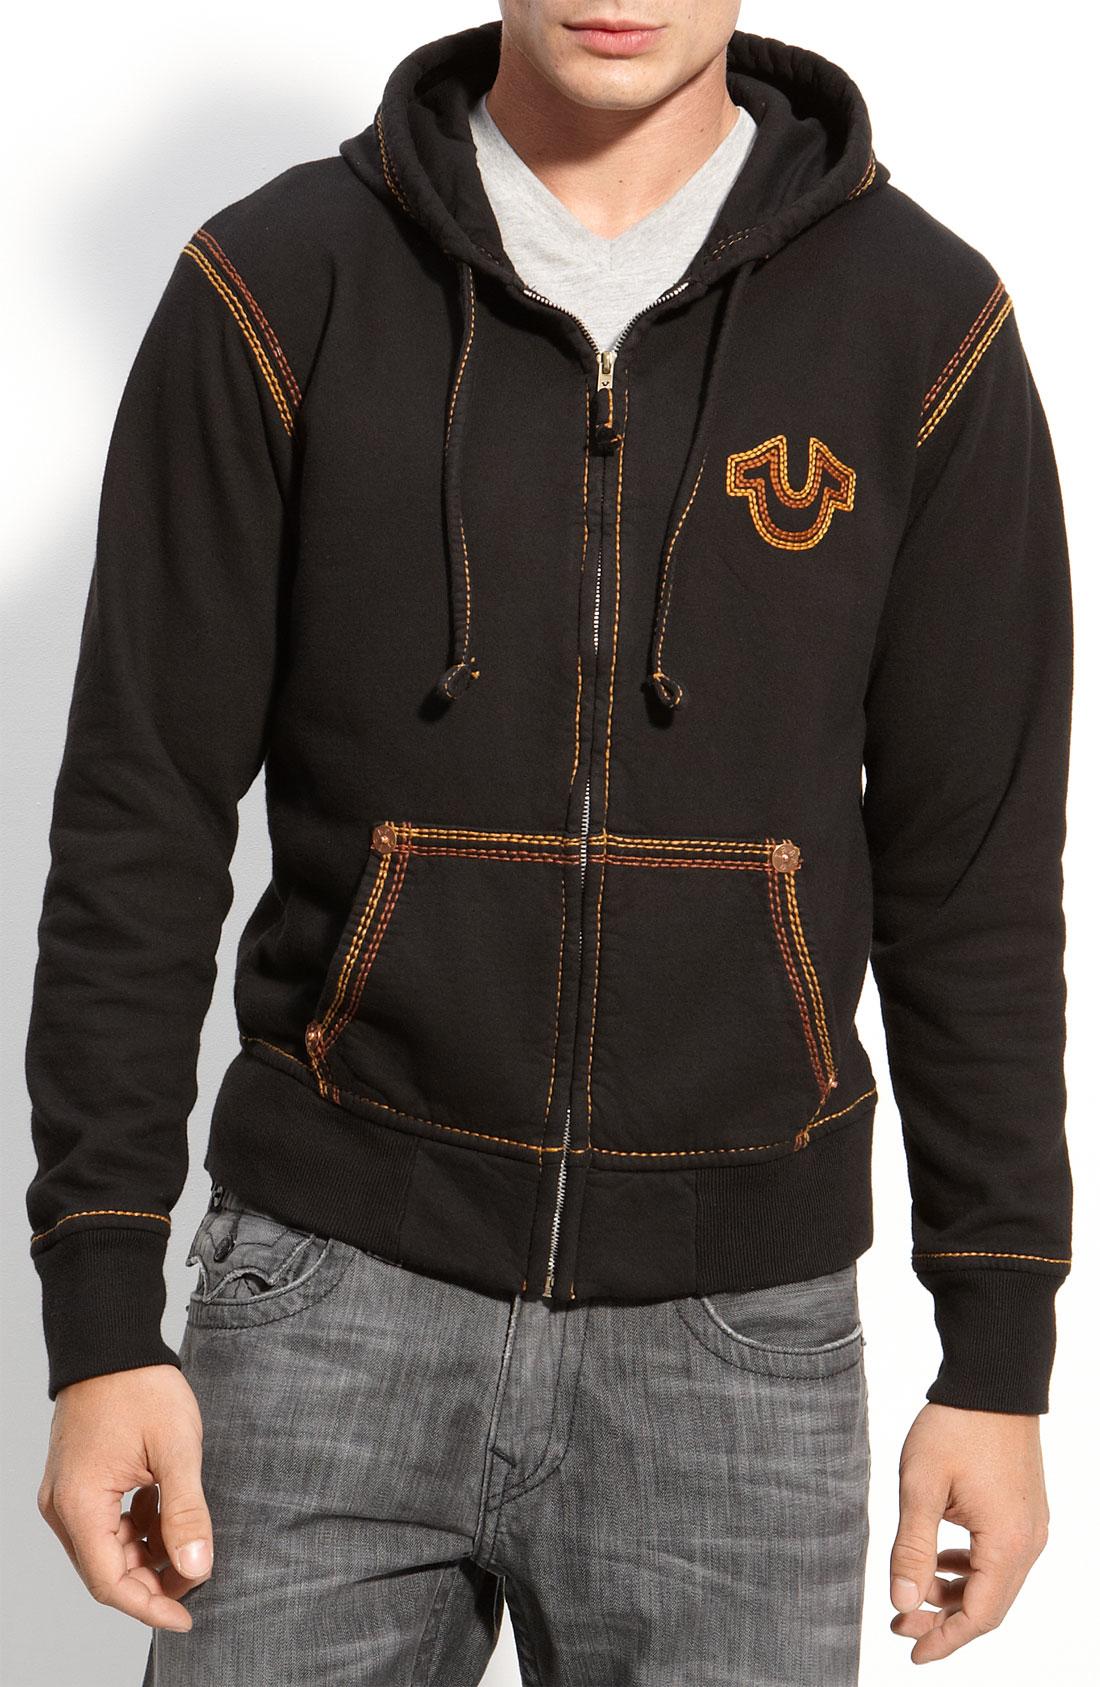 True religion hoodies